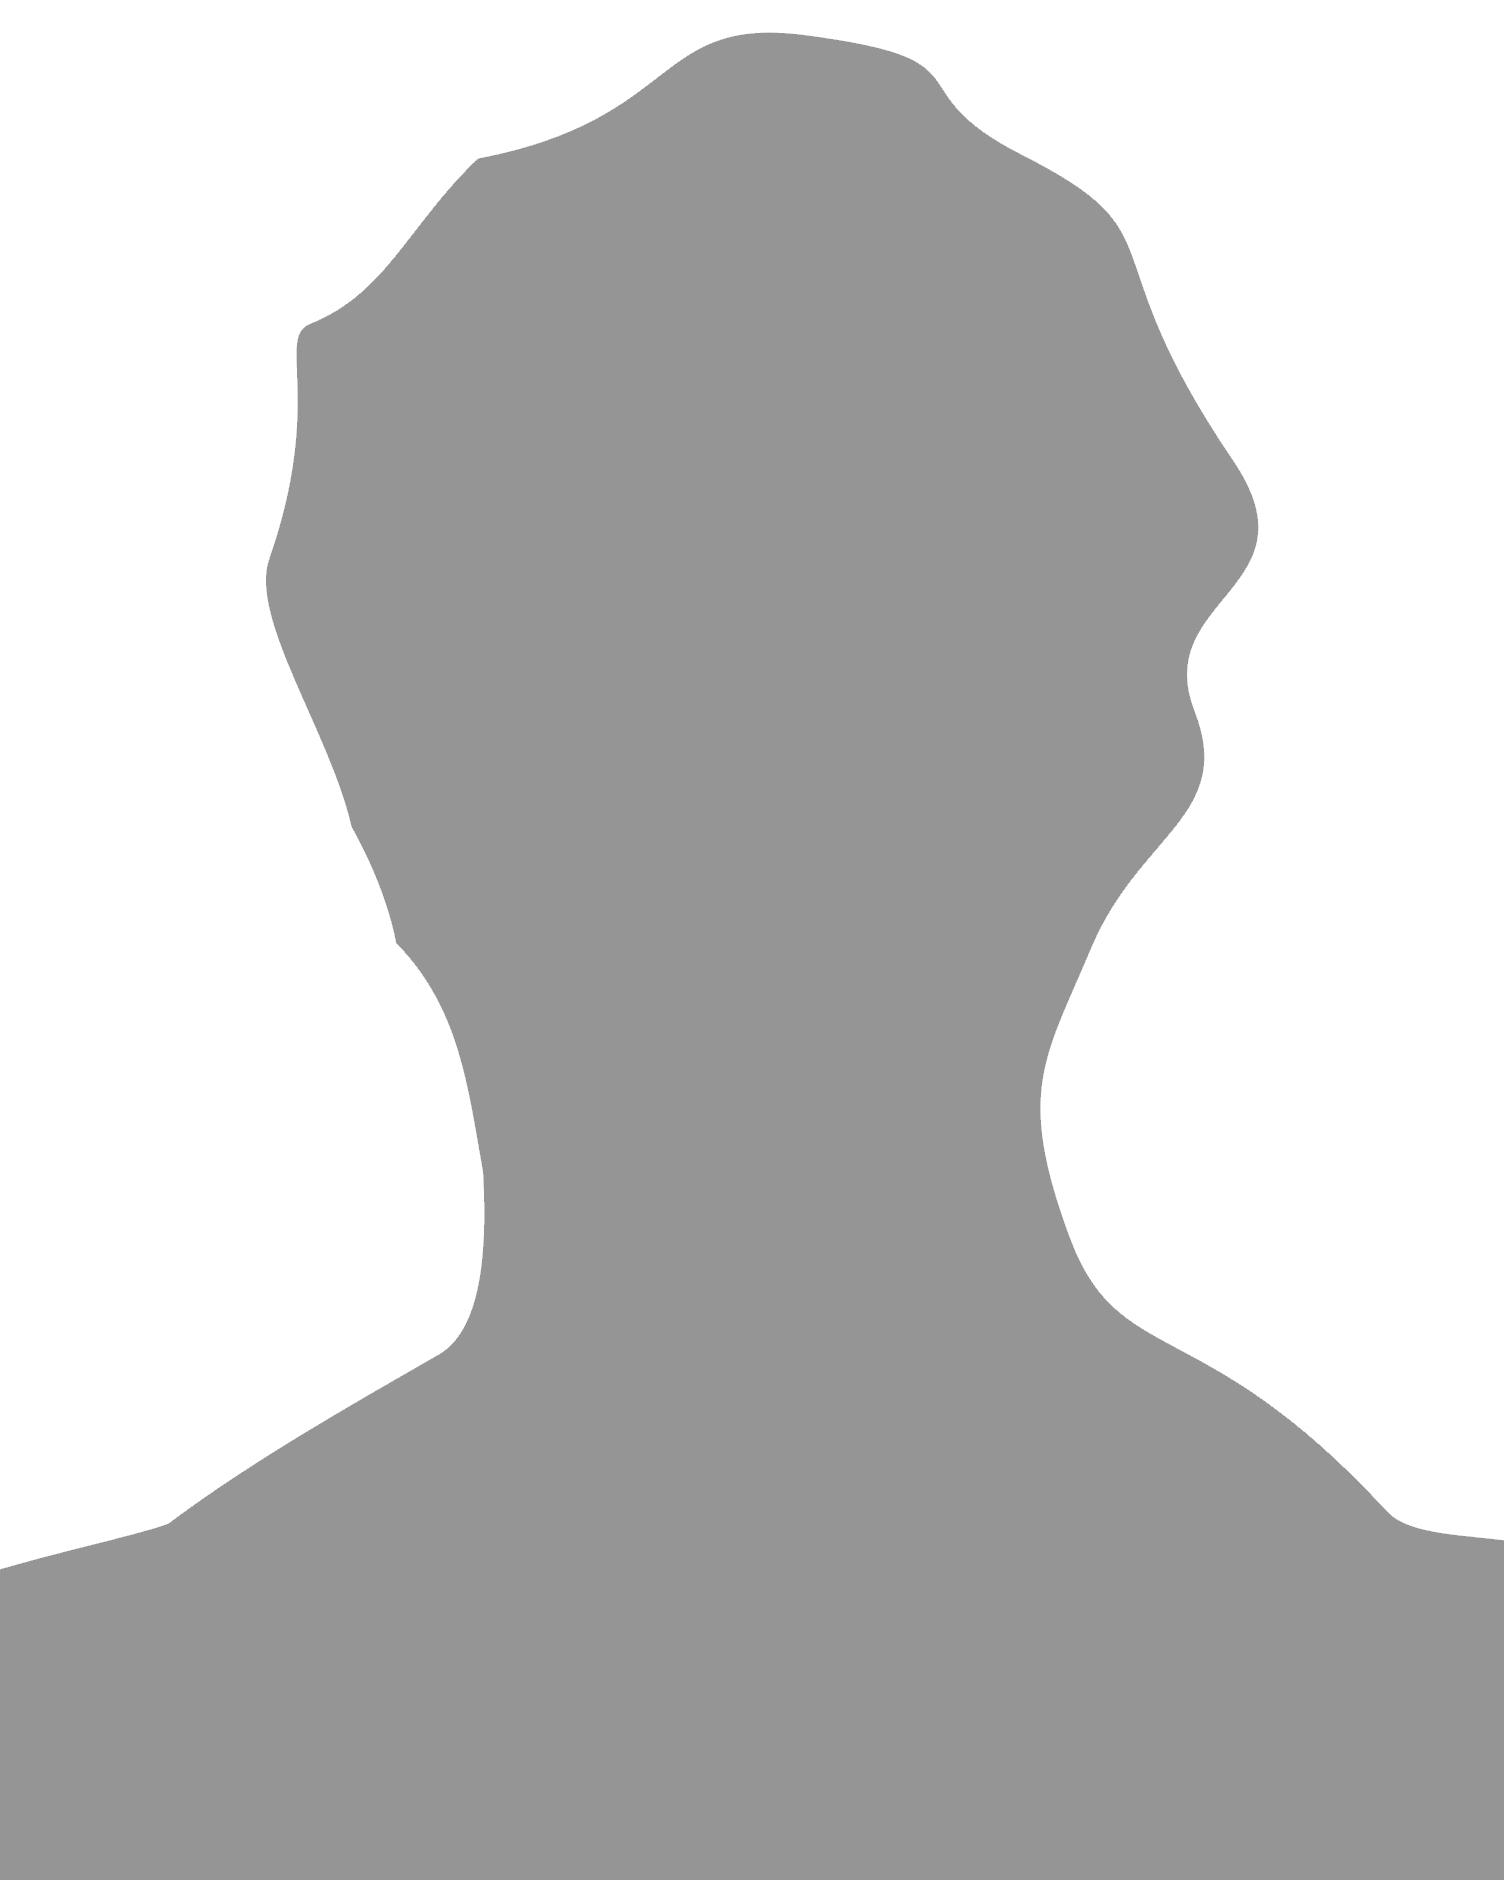 Blank_portrait,_male_(rectangular)